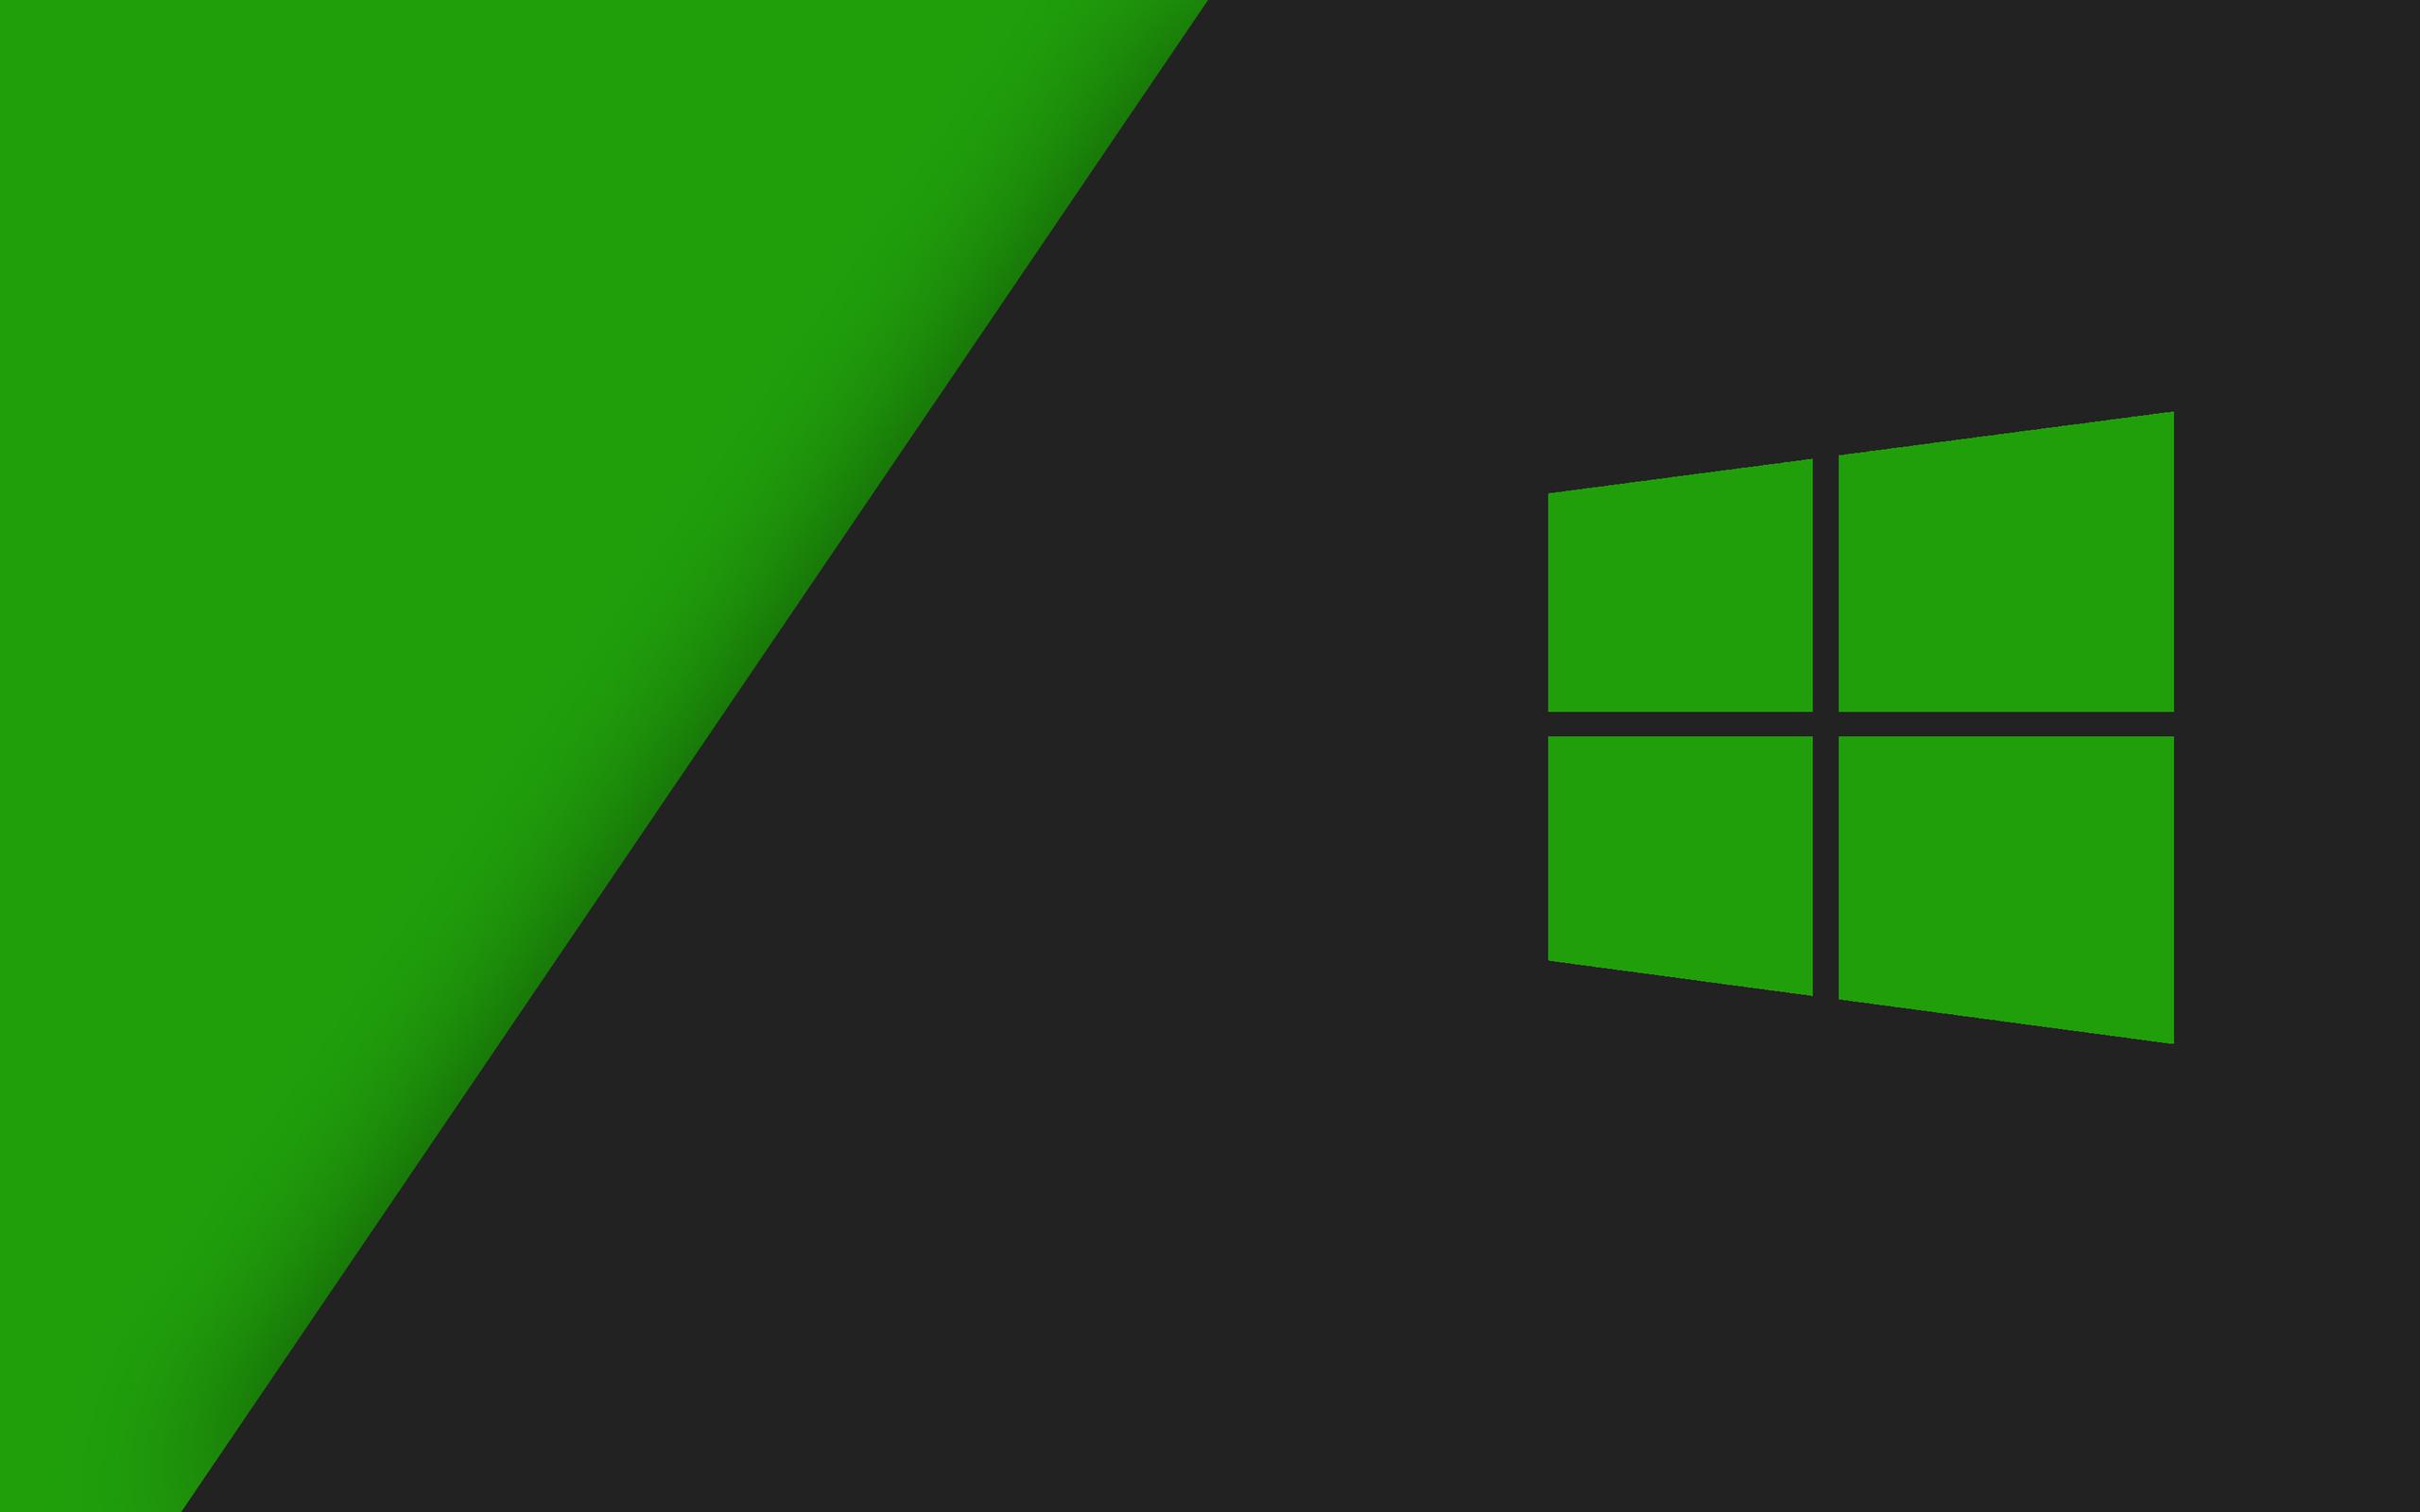 windows, 10, wallpaper, green, grey